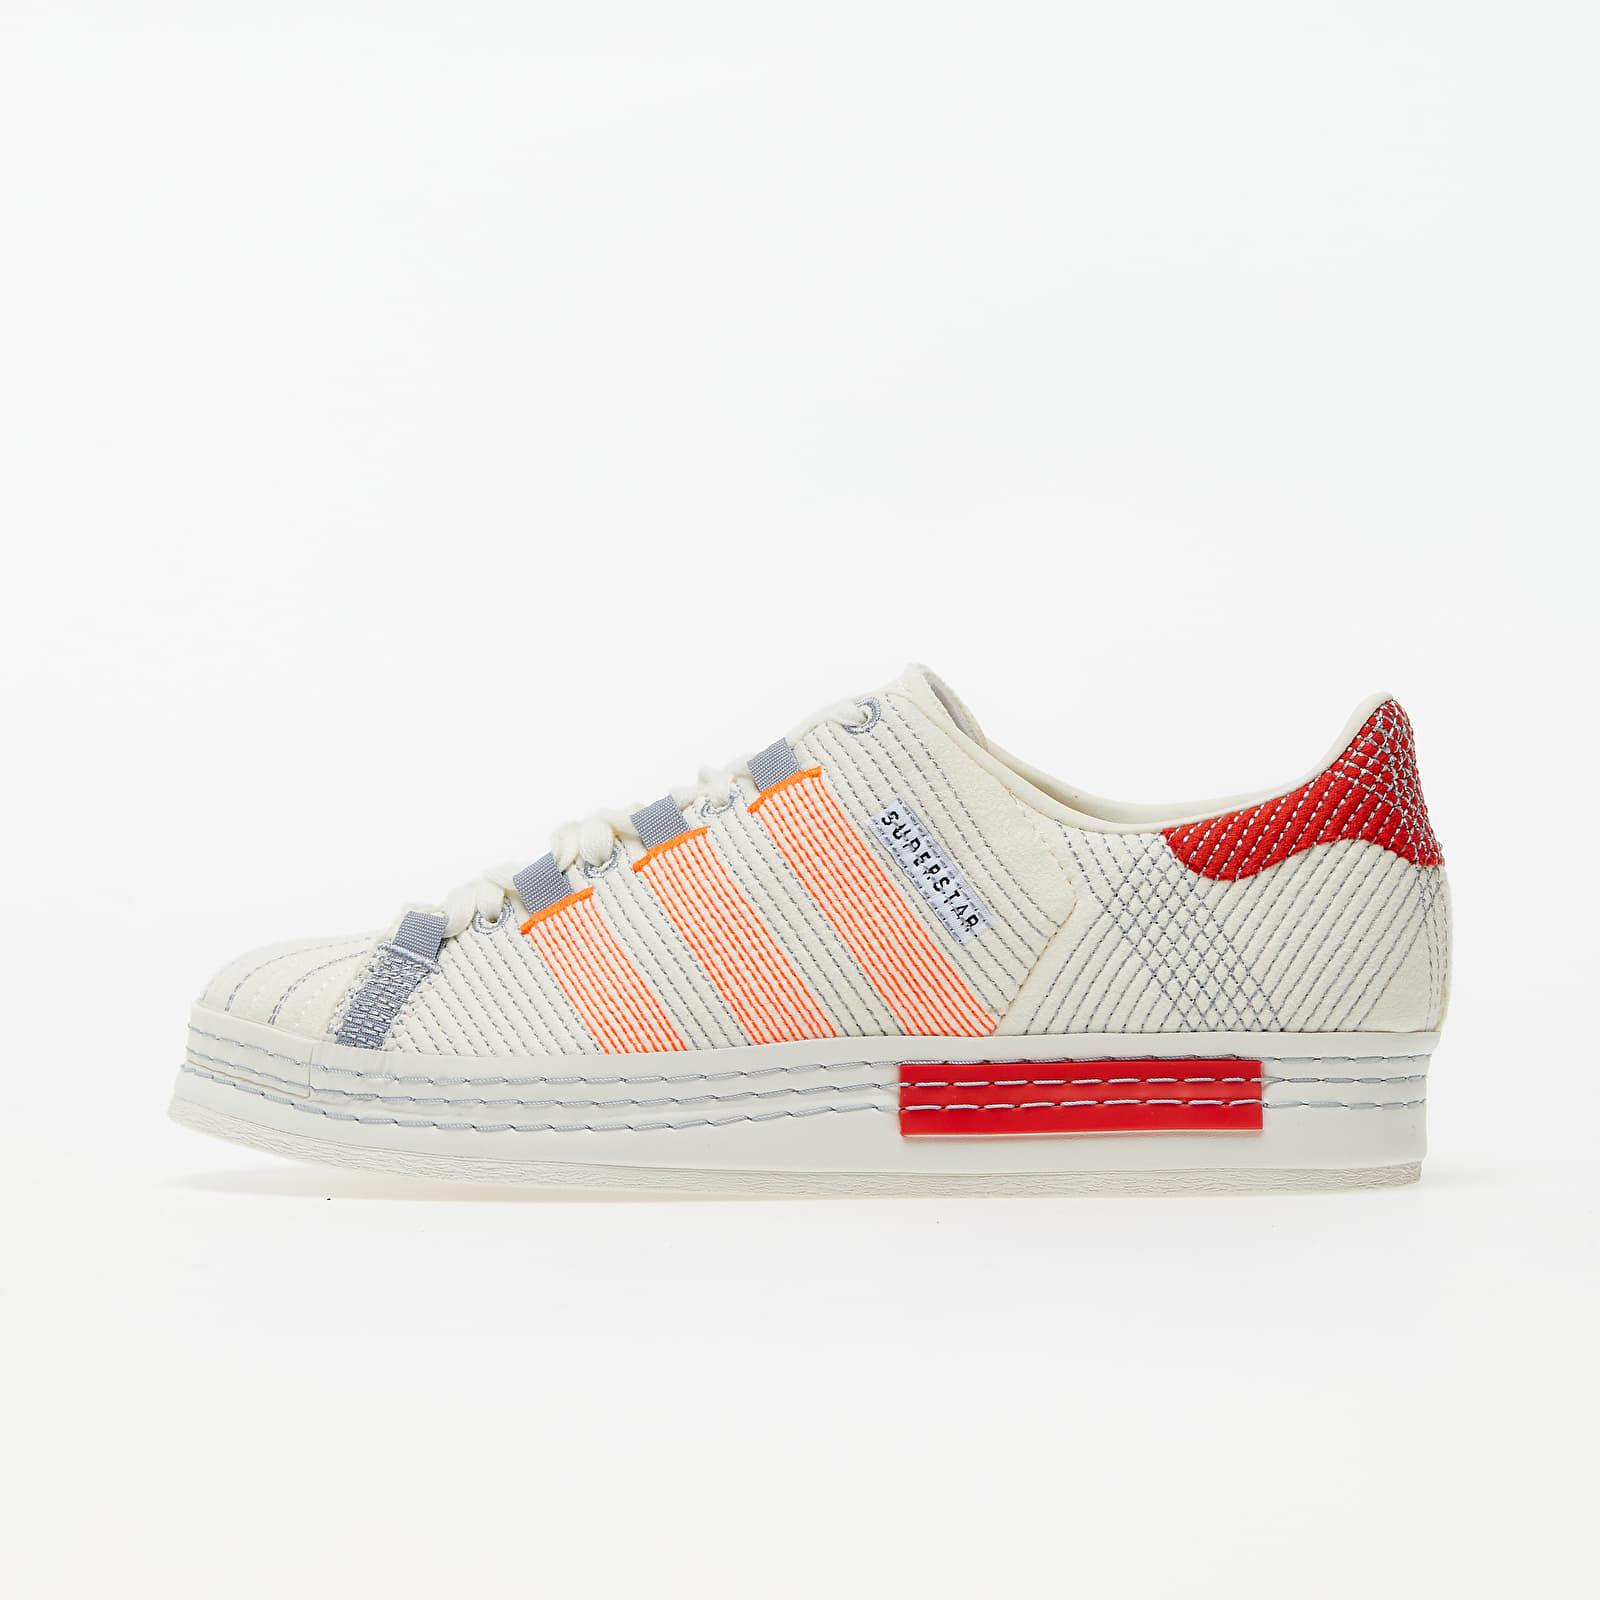 adidas x Craig Green Superstar Off White/ Bright Red/ Grey Three EUR 41 1/3